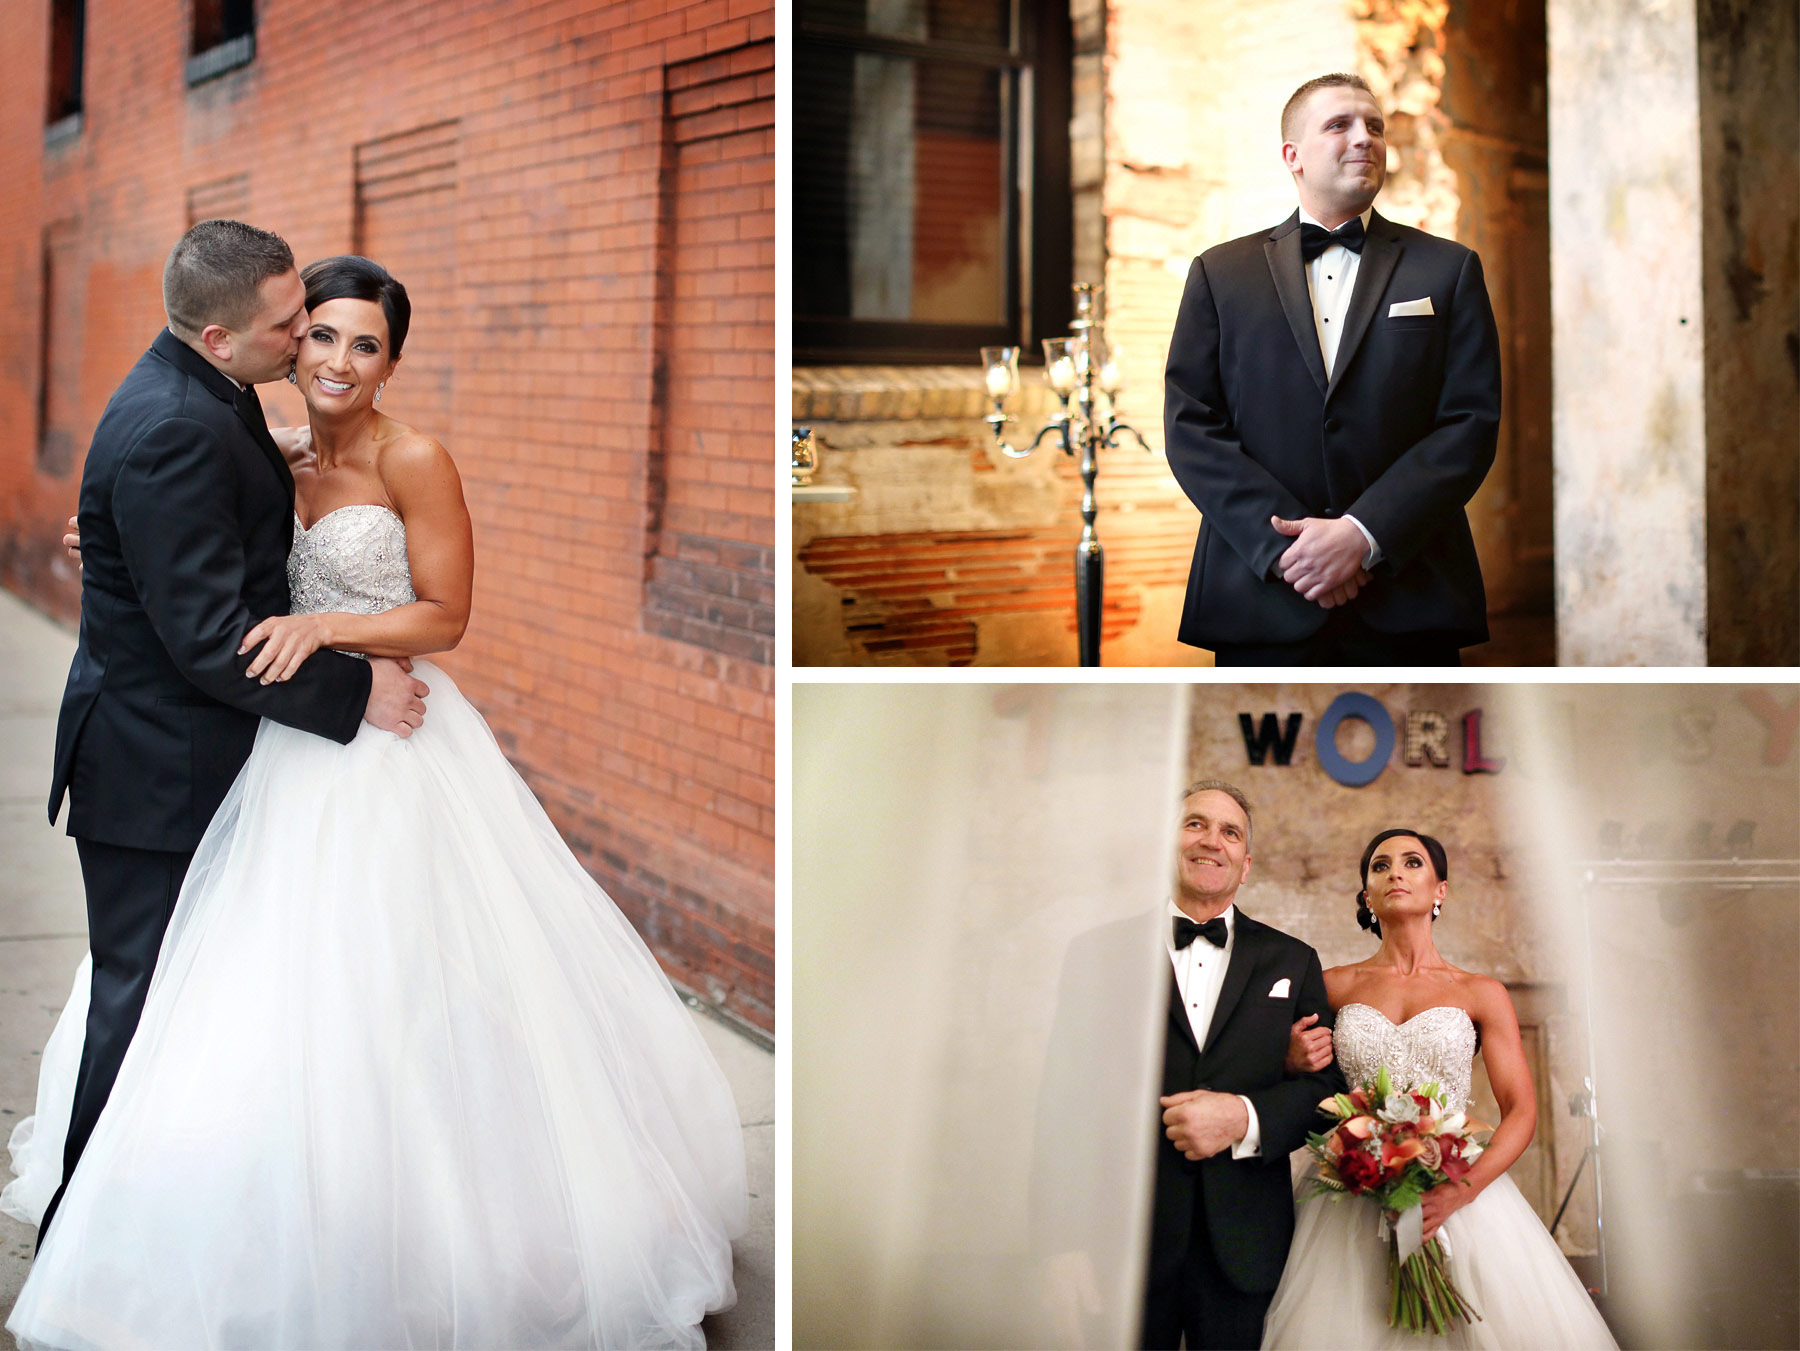 09-Minneapolis-Minnesota-Wedding-Photography-Aria-Downtown-Industrial-Ceremony-Melanie-and-Andrew.jpg